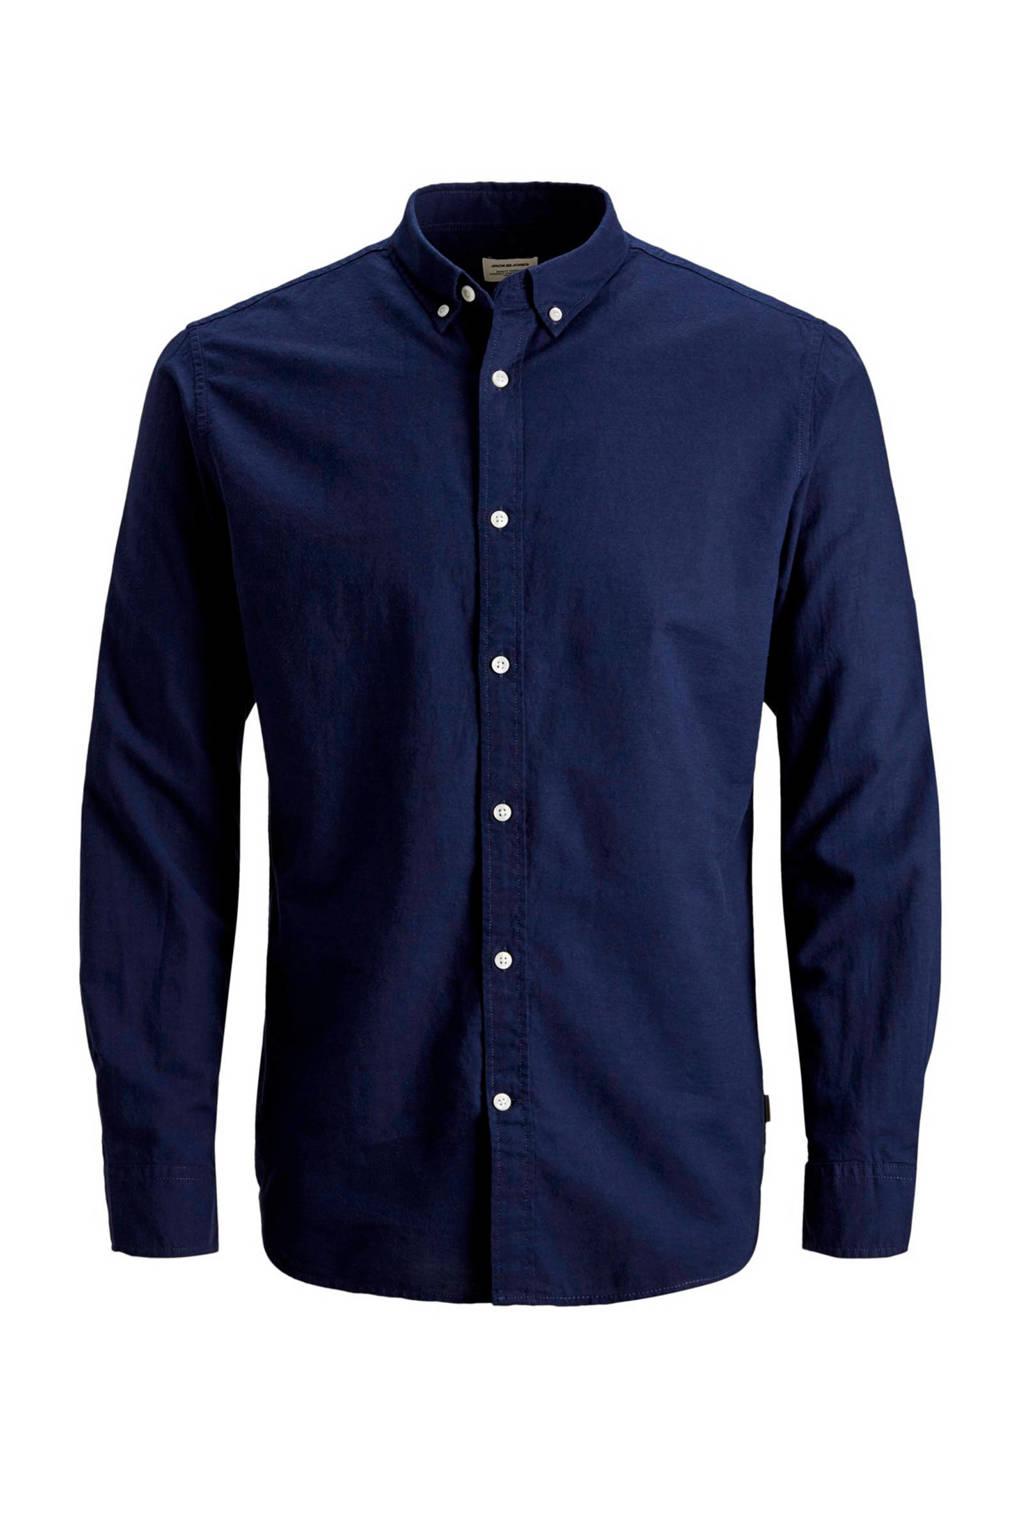 Jack & Jones Essentials slim fit overhemd, Donkerblauw